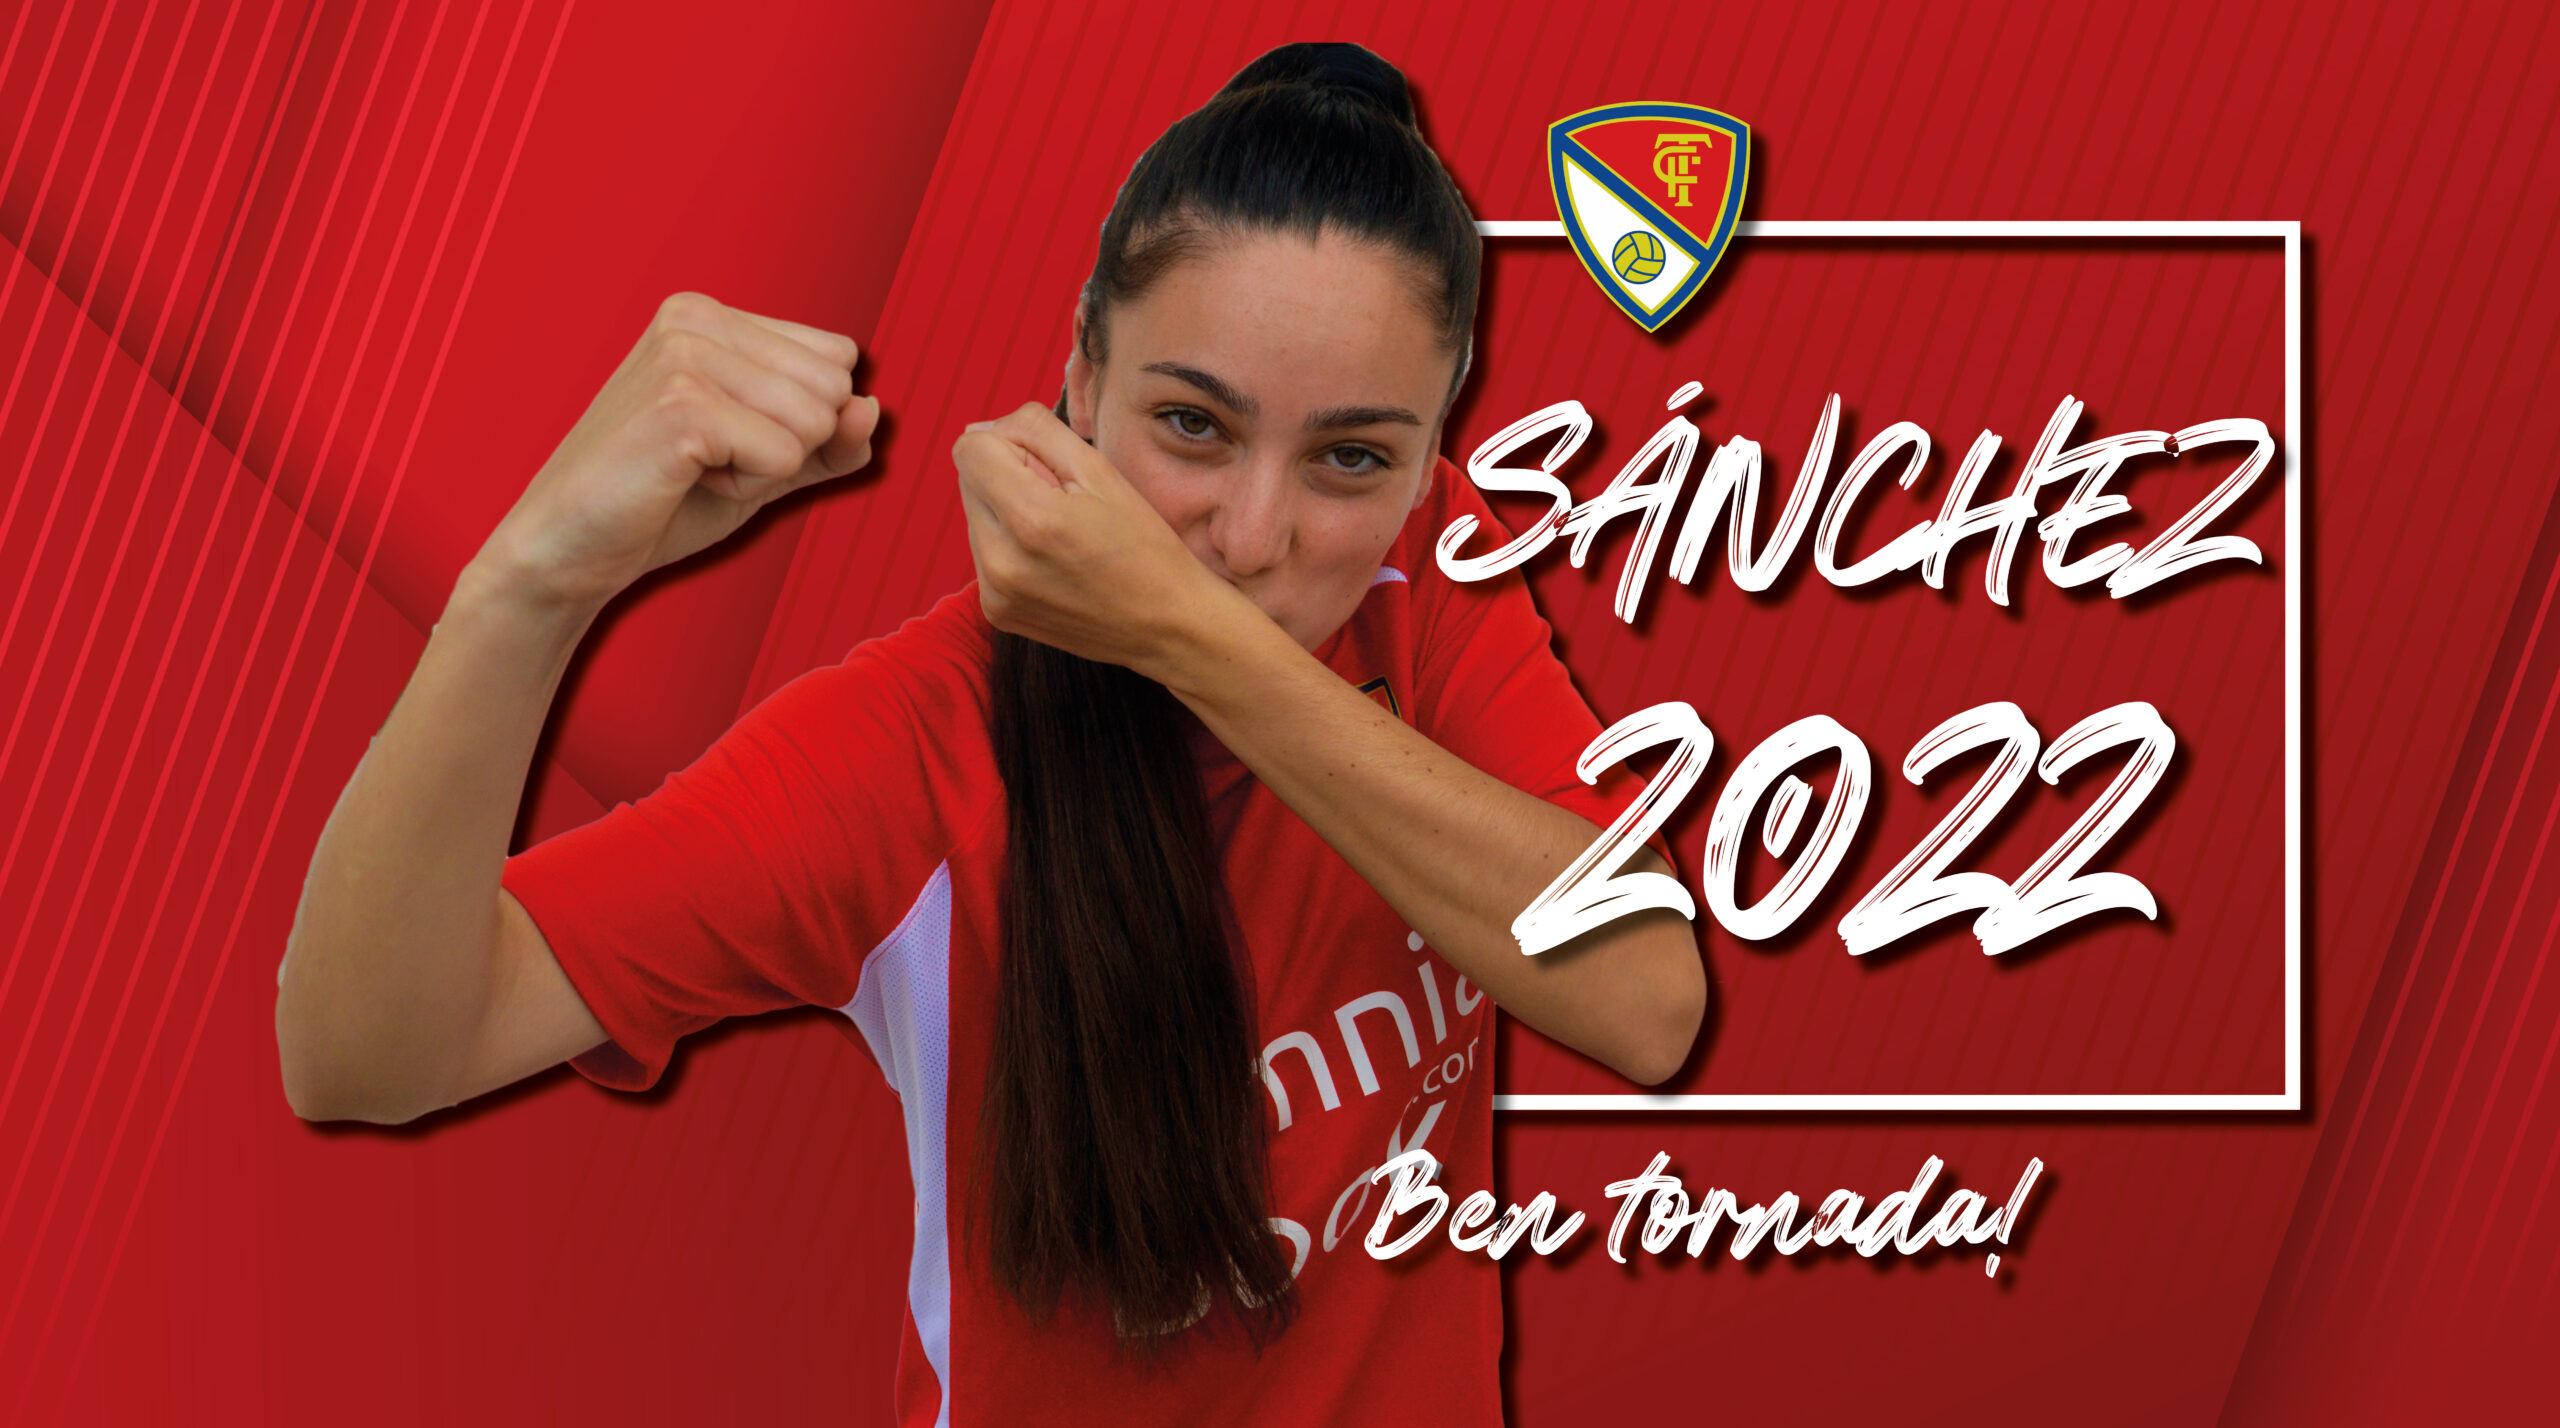 Carla Sánchez Lora